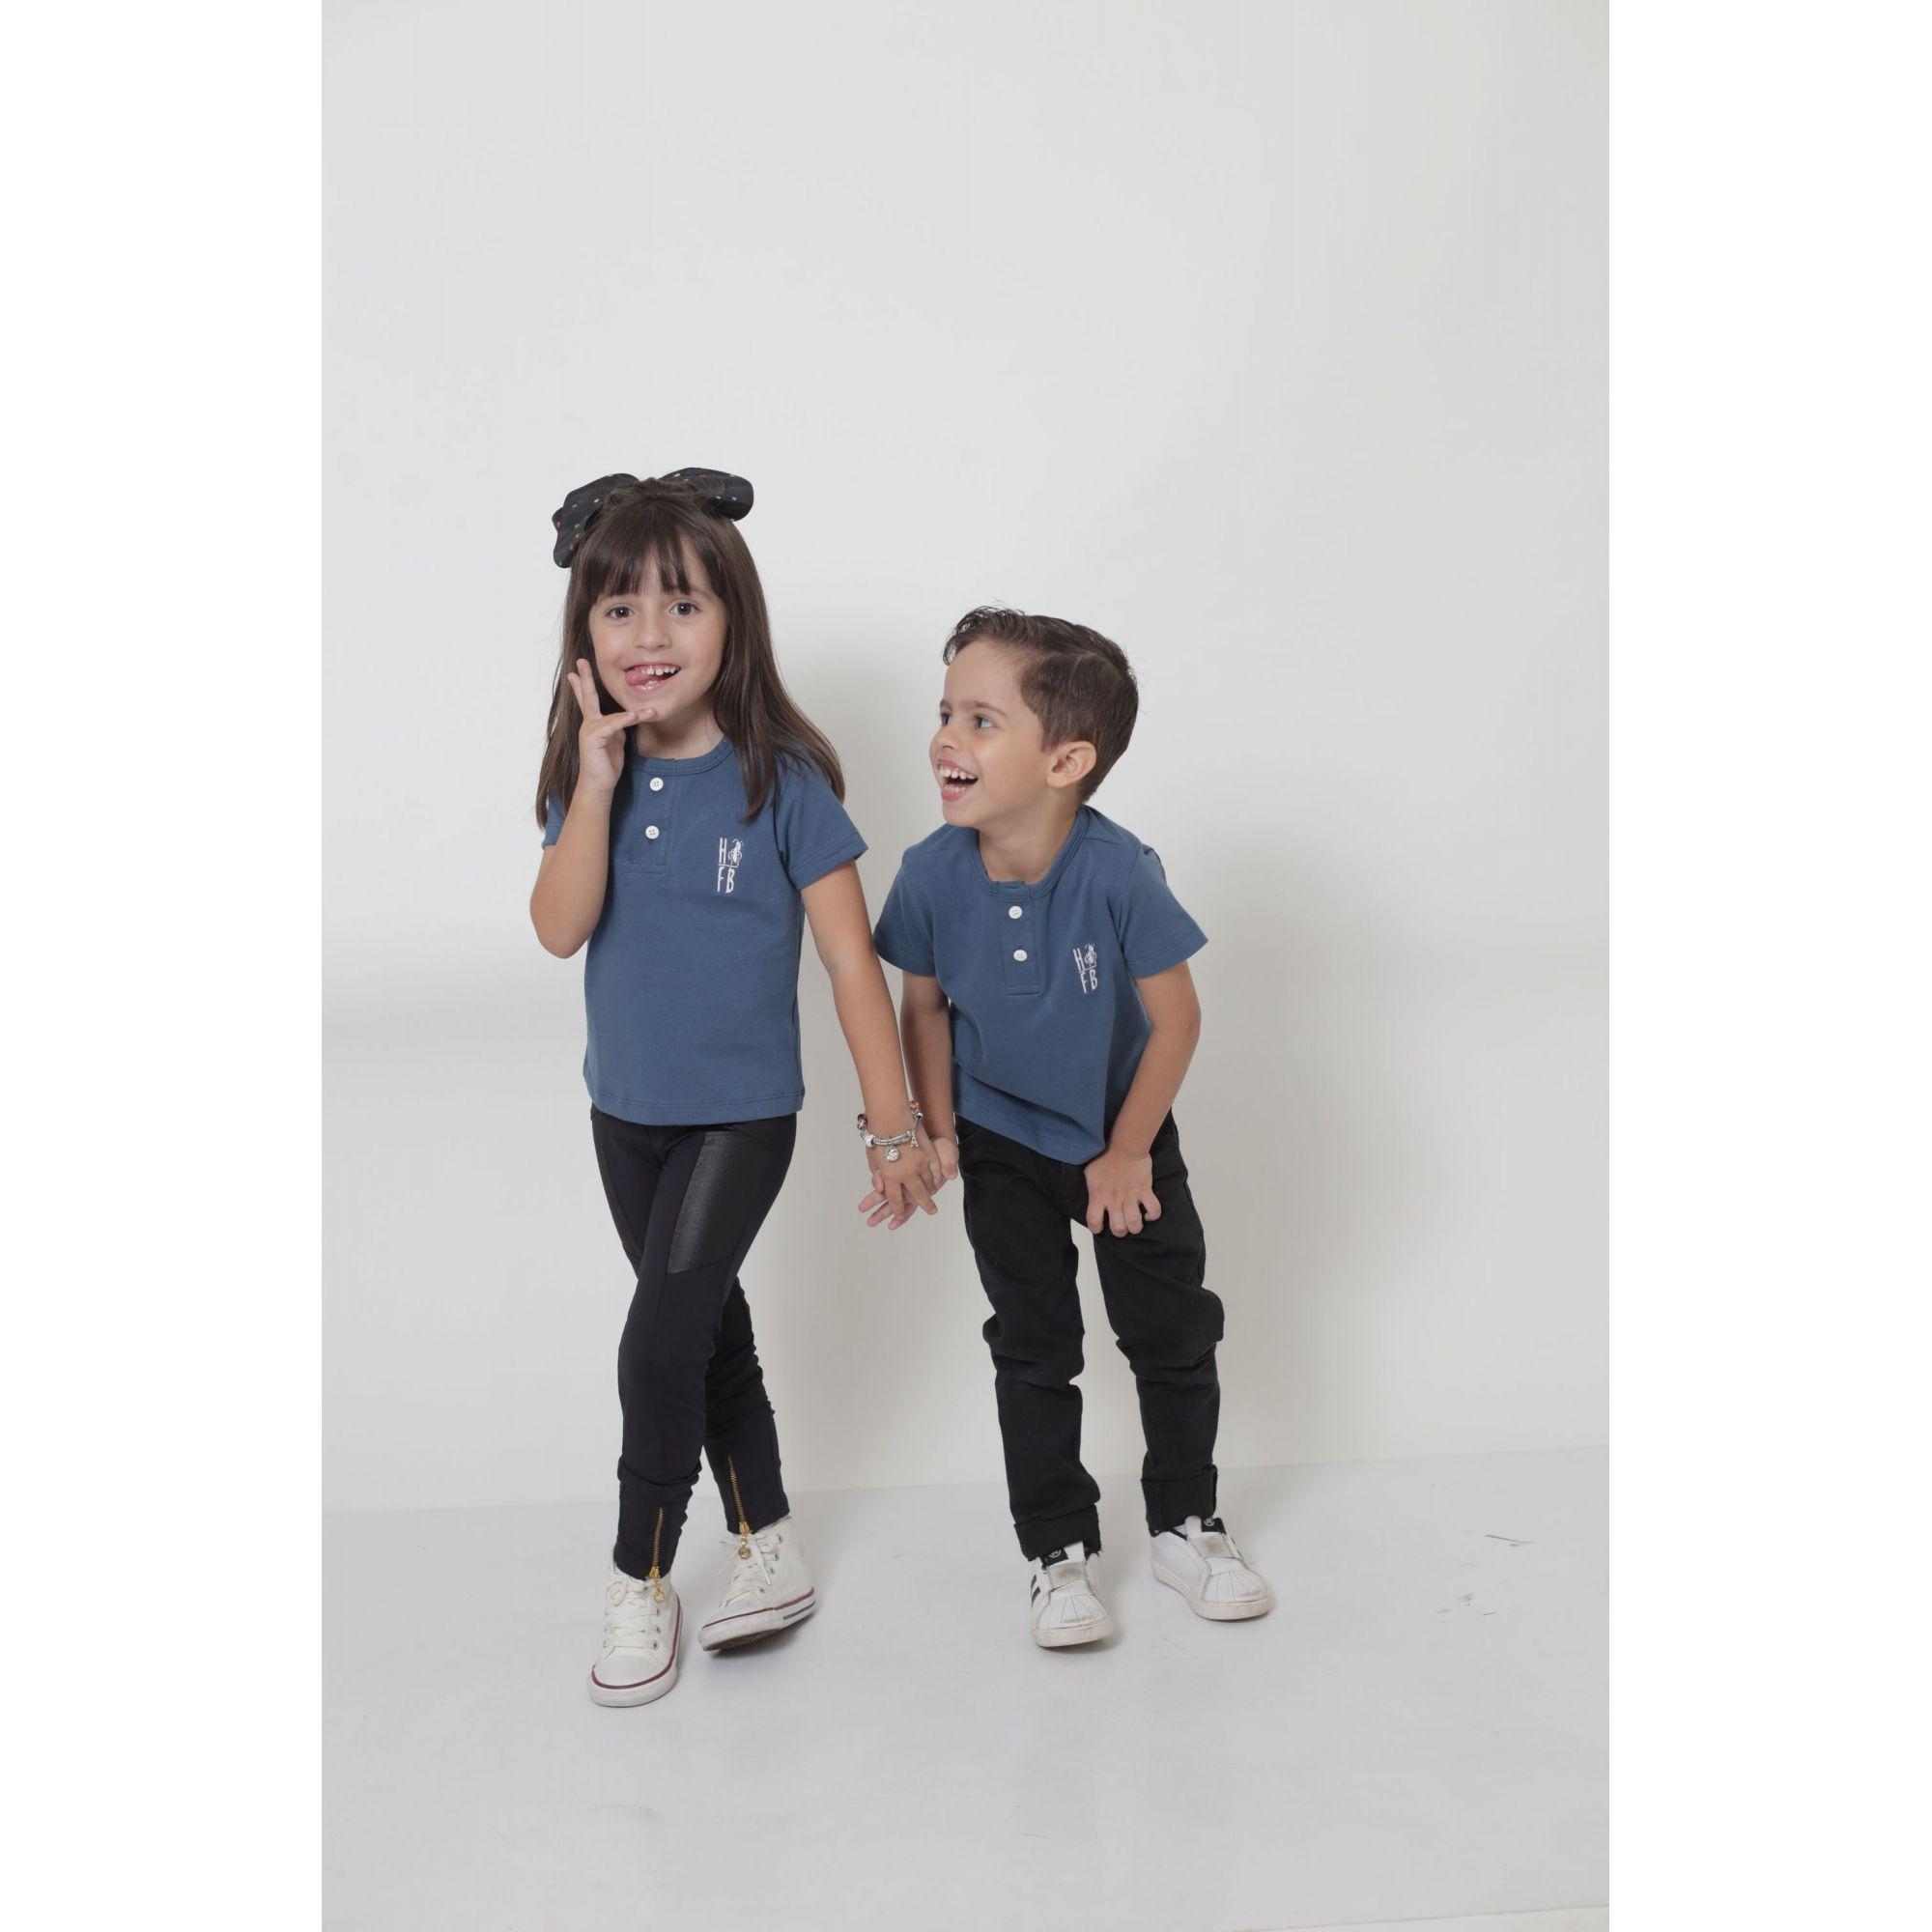 MÃE E FILHA > Kit 02 Peças T-Shirts ou Body Henley - Azul Petróleo [Coleção Tal Mãe Tal Filha]  - Heitor Fashion Brazil